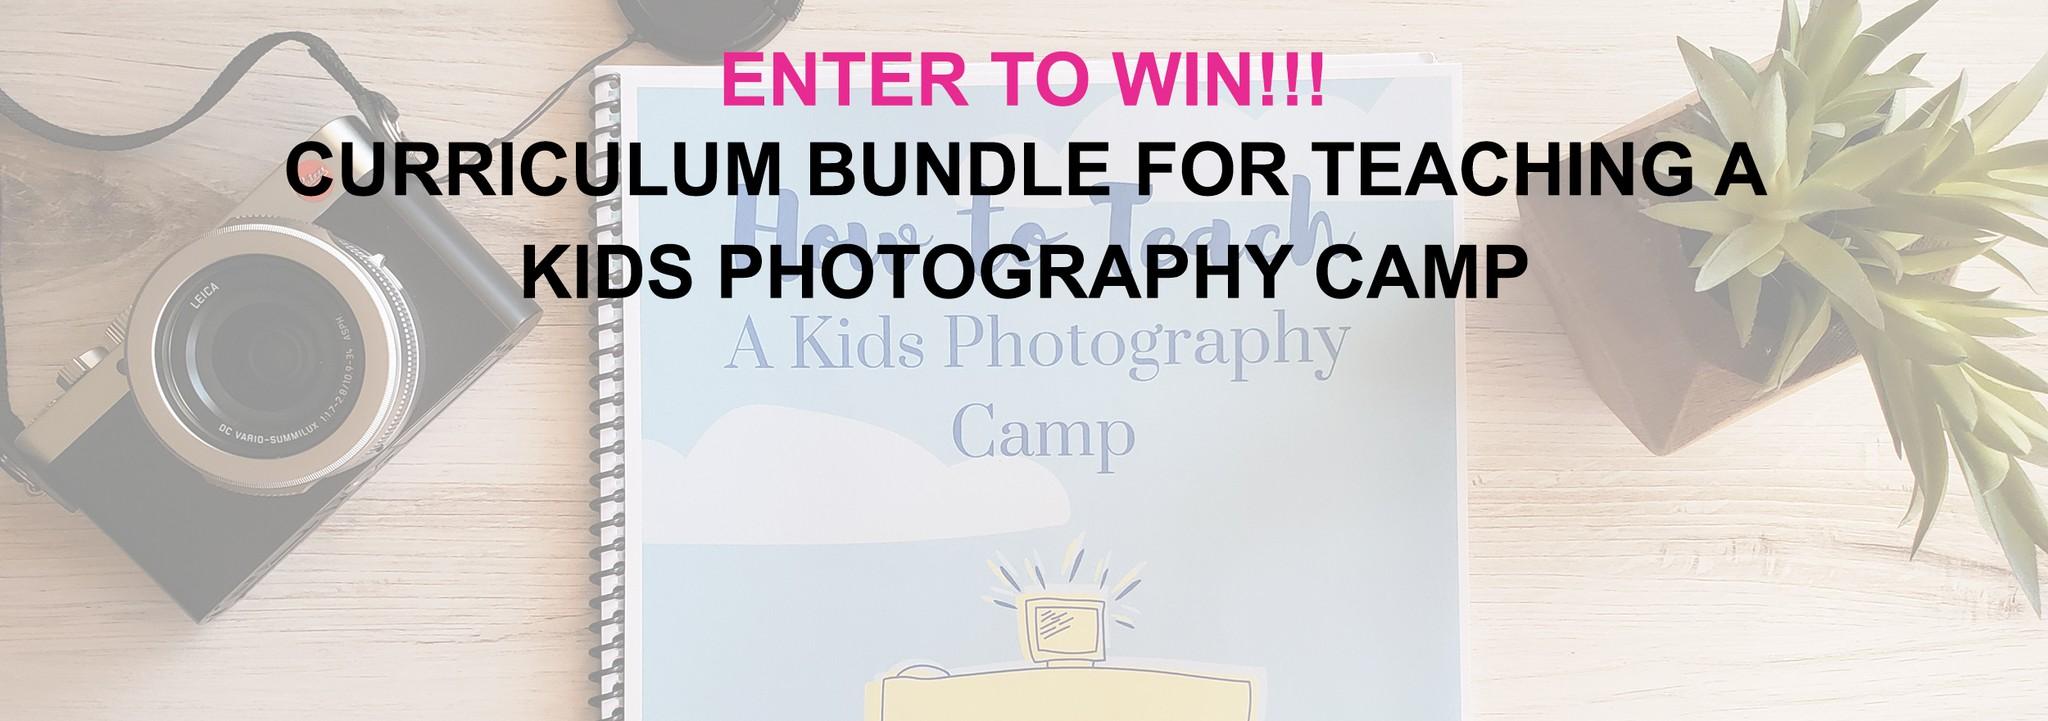 Enter to Win a Kids Photography Camp Curriculum Bundle